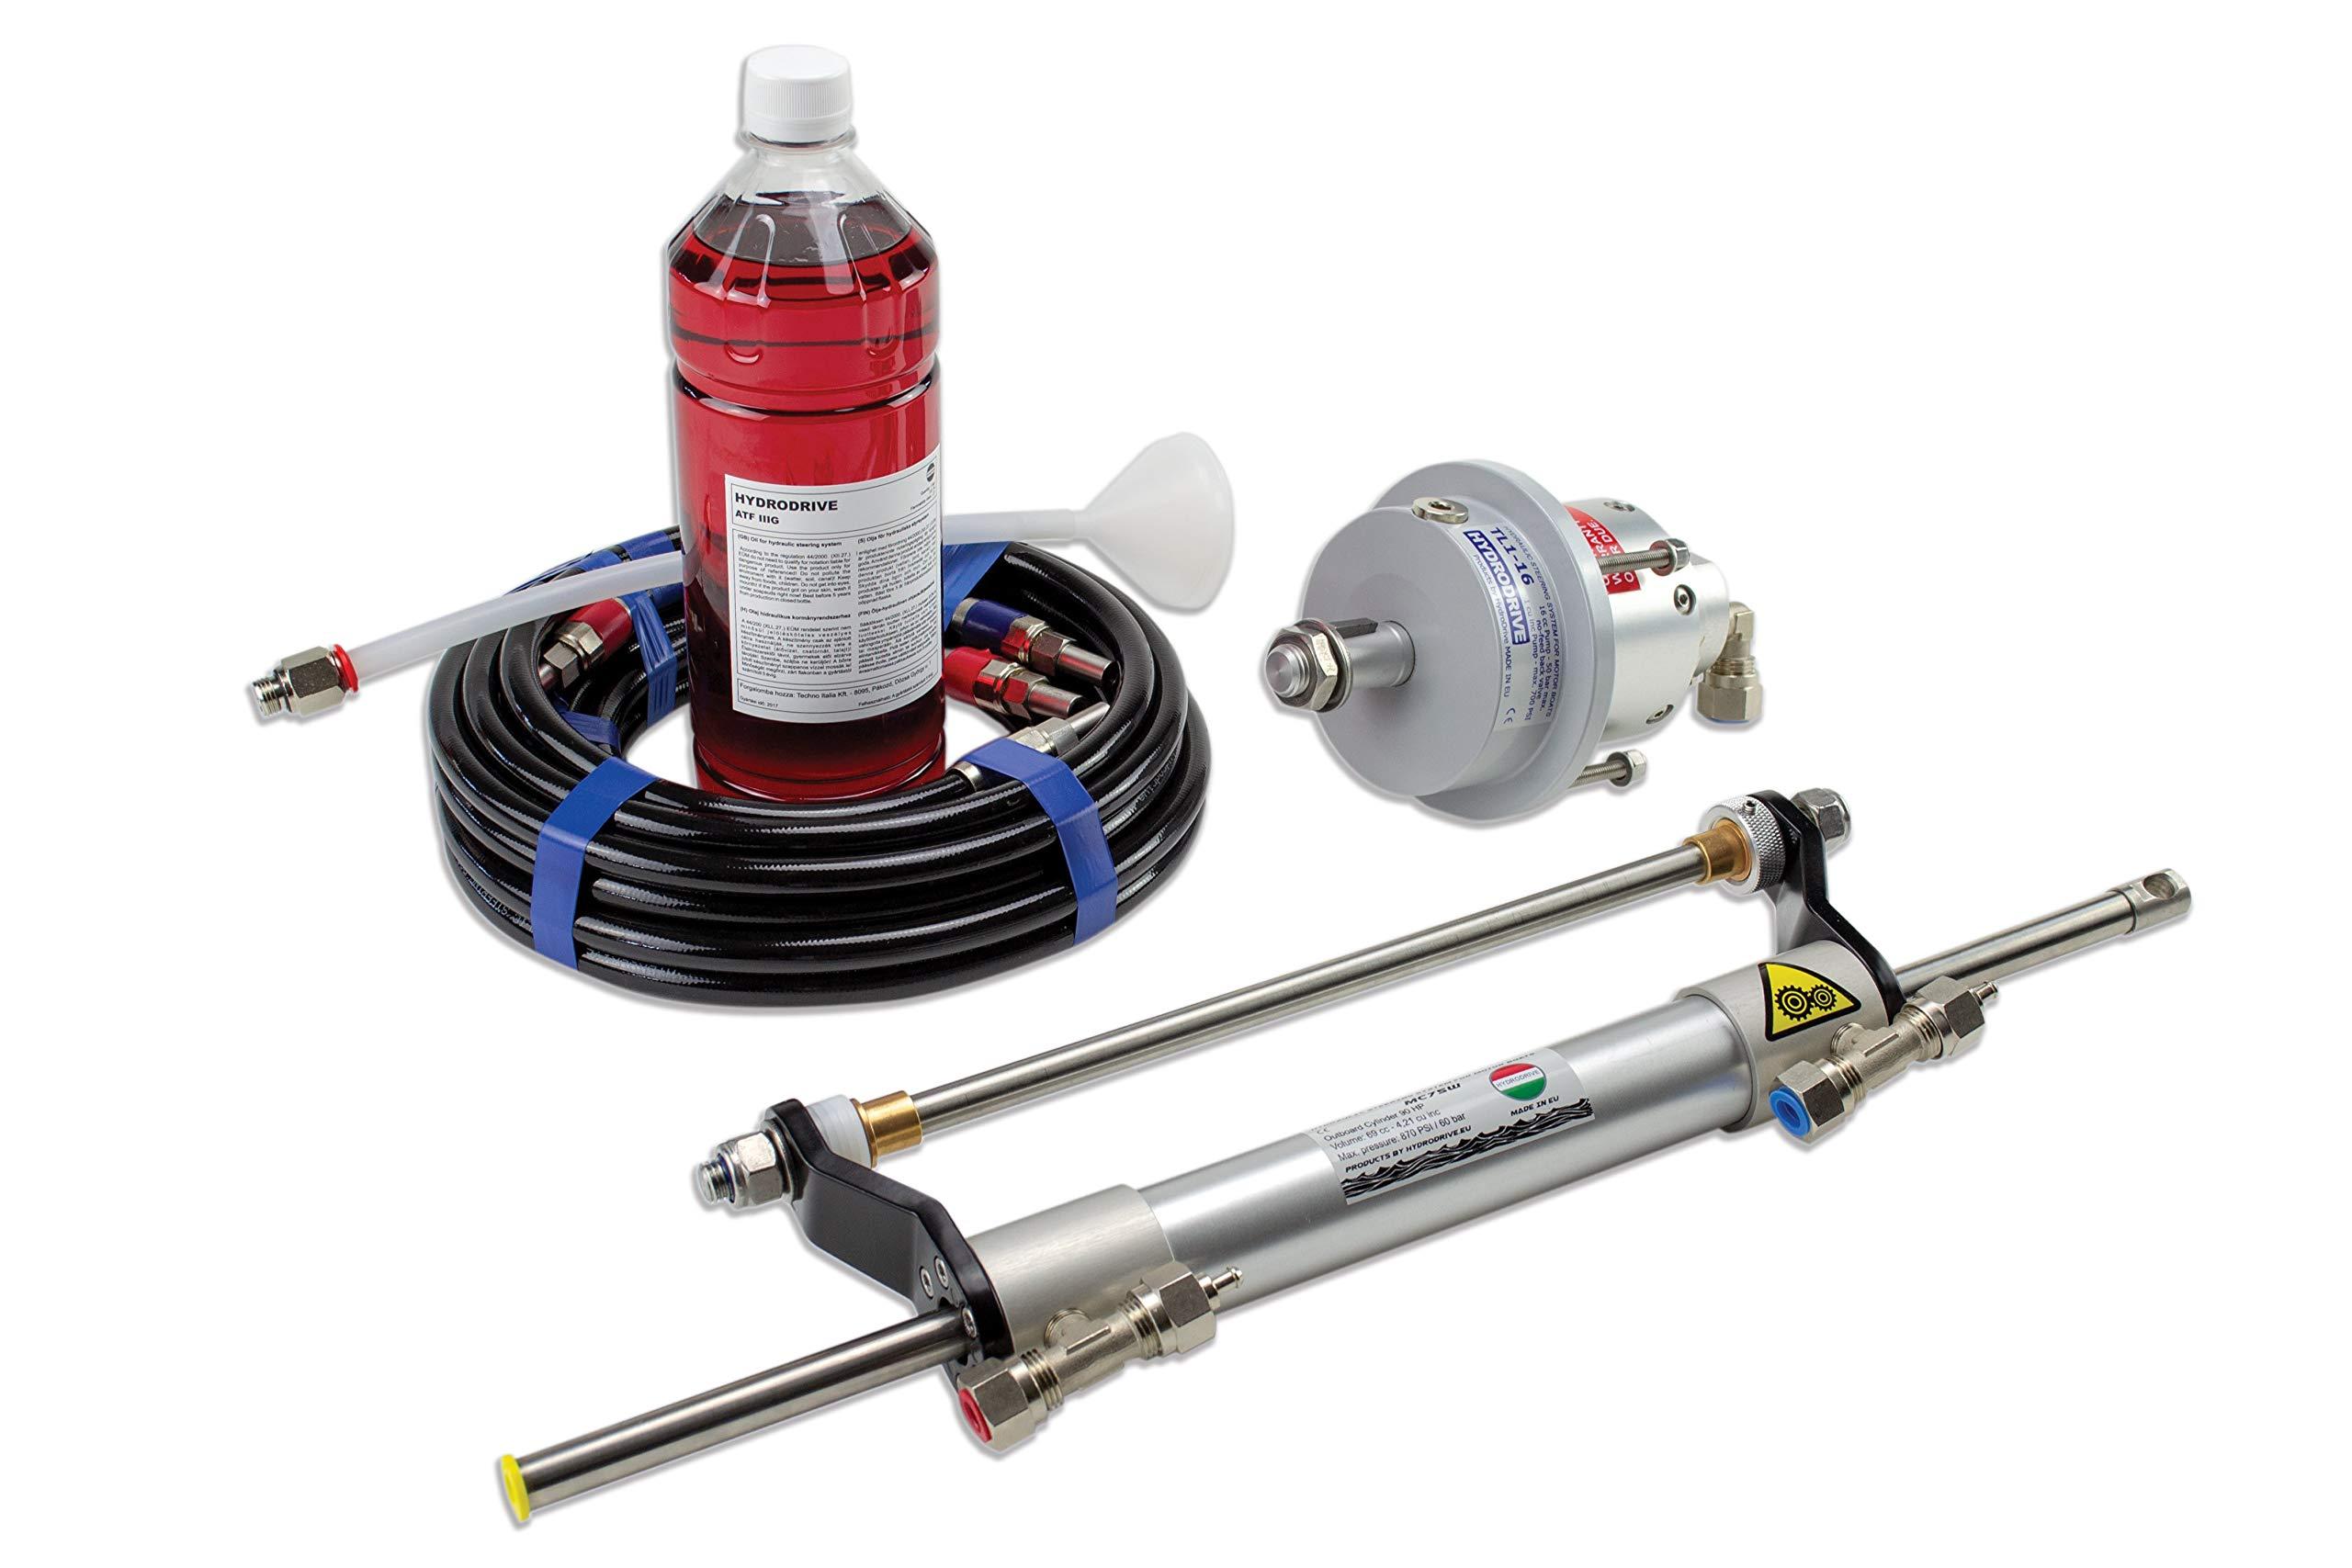 Hydrodrive MF75W Outboard Hydraulic Steering System Till 75 HP by Hydrodrive